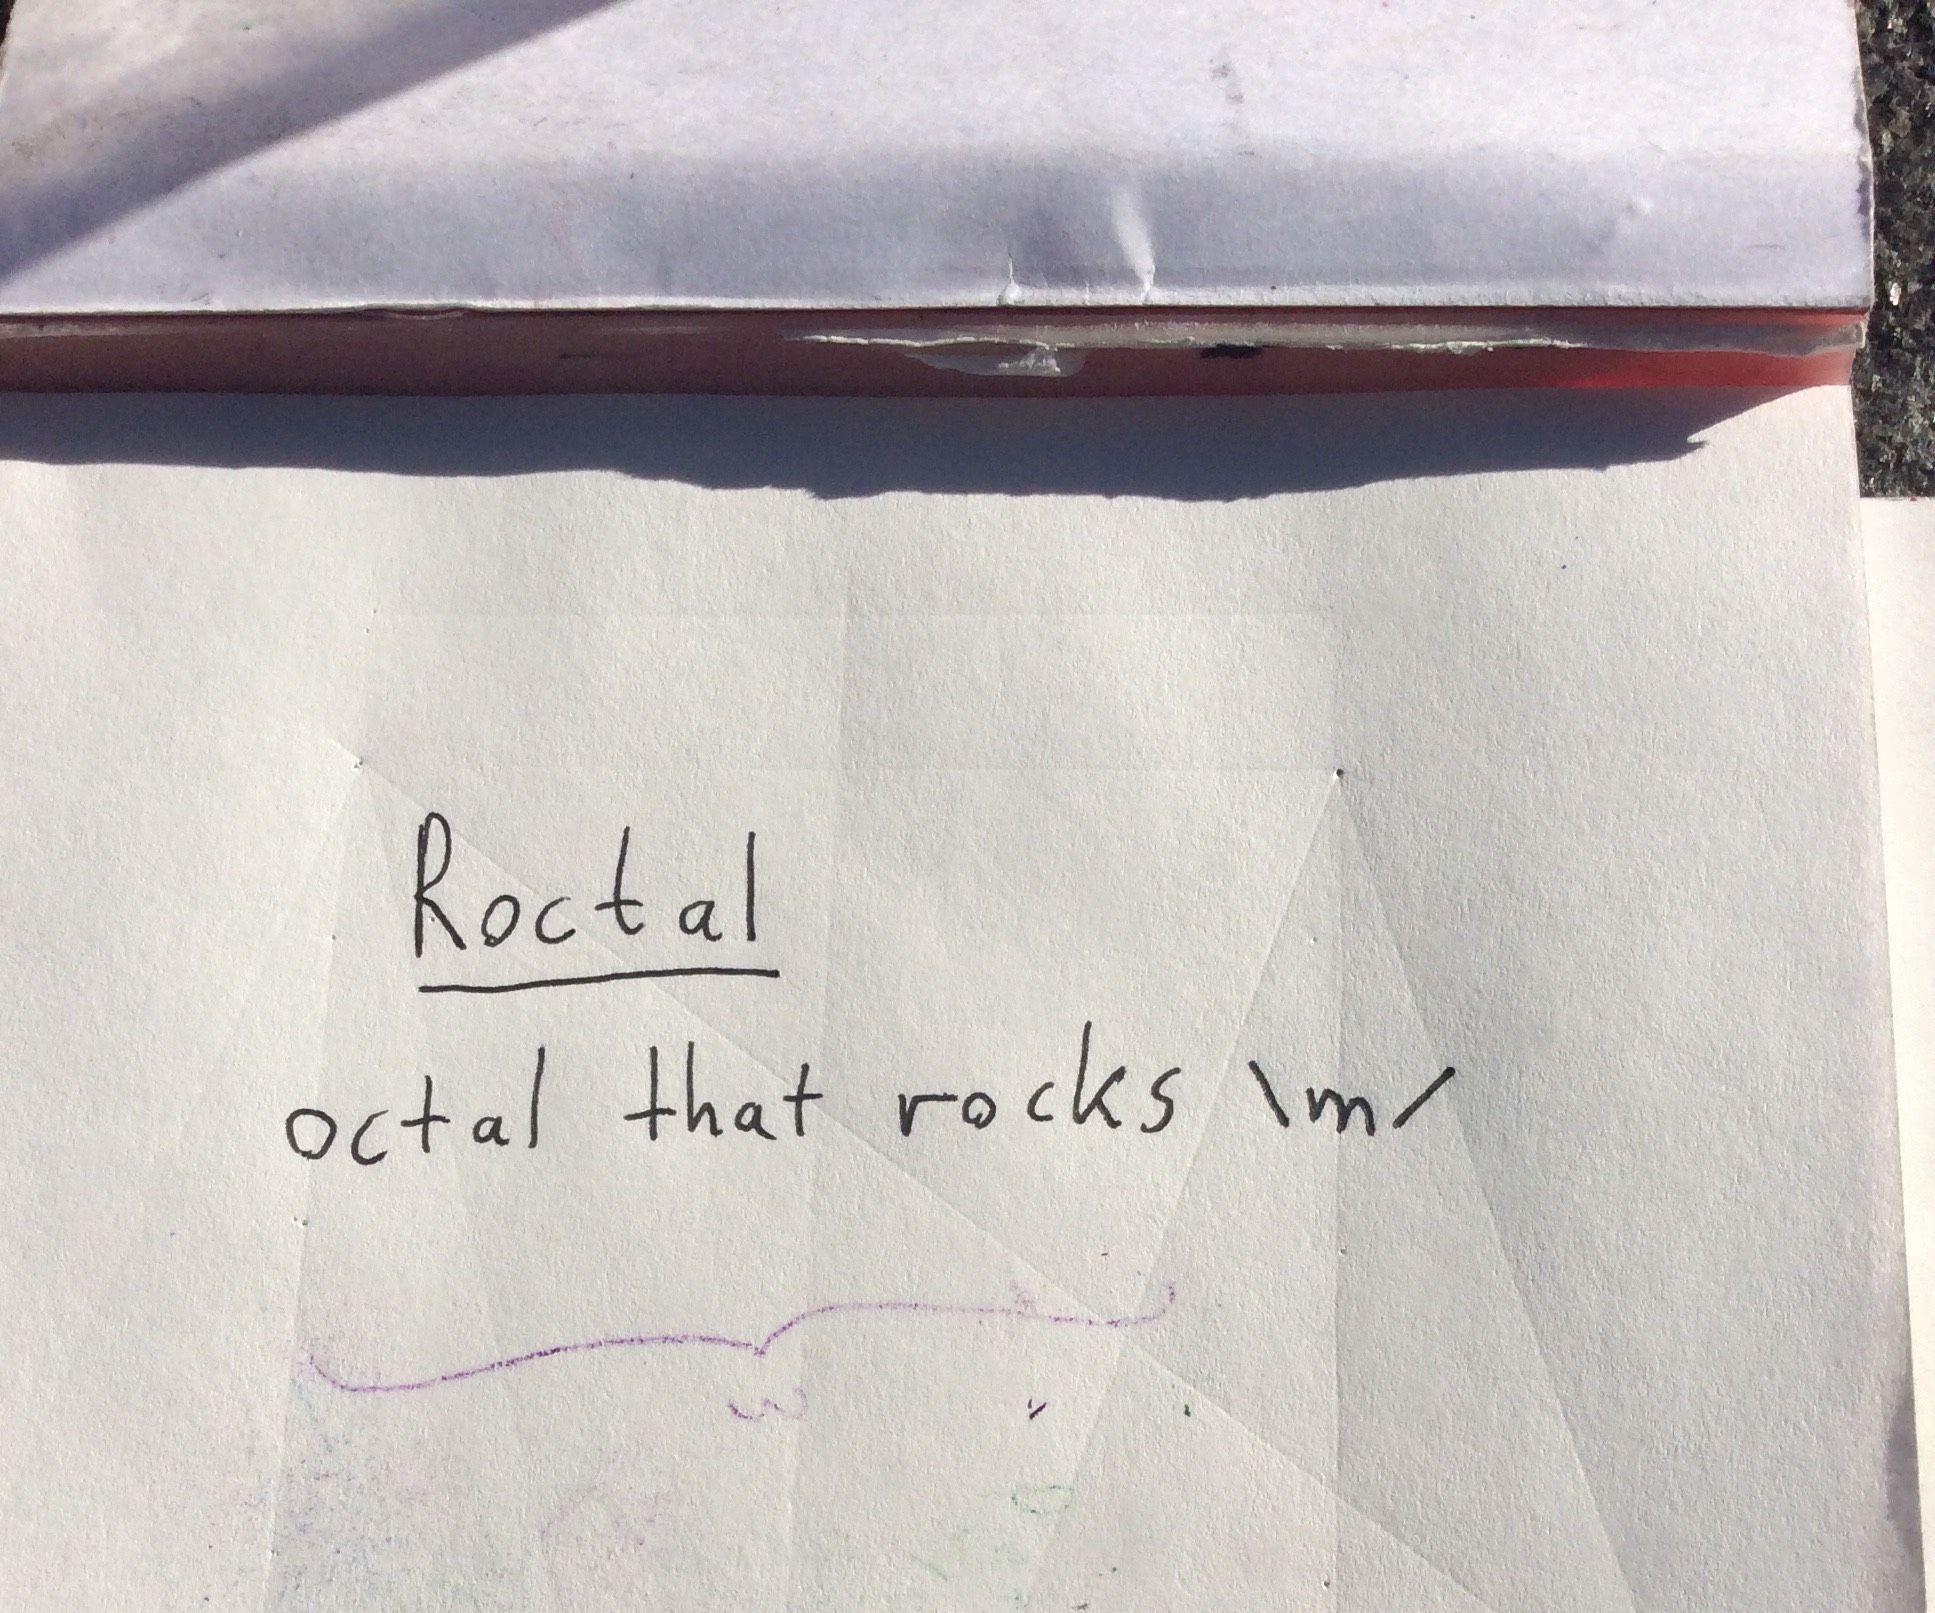 Encode A Message In Roctal, Octal That Rocks